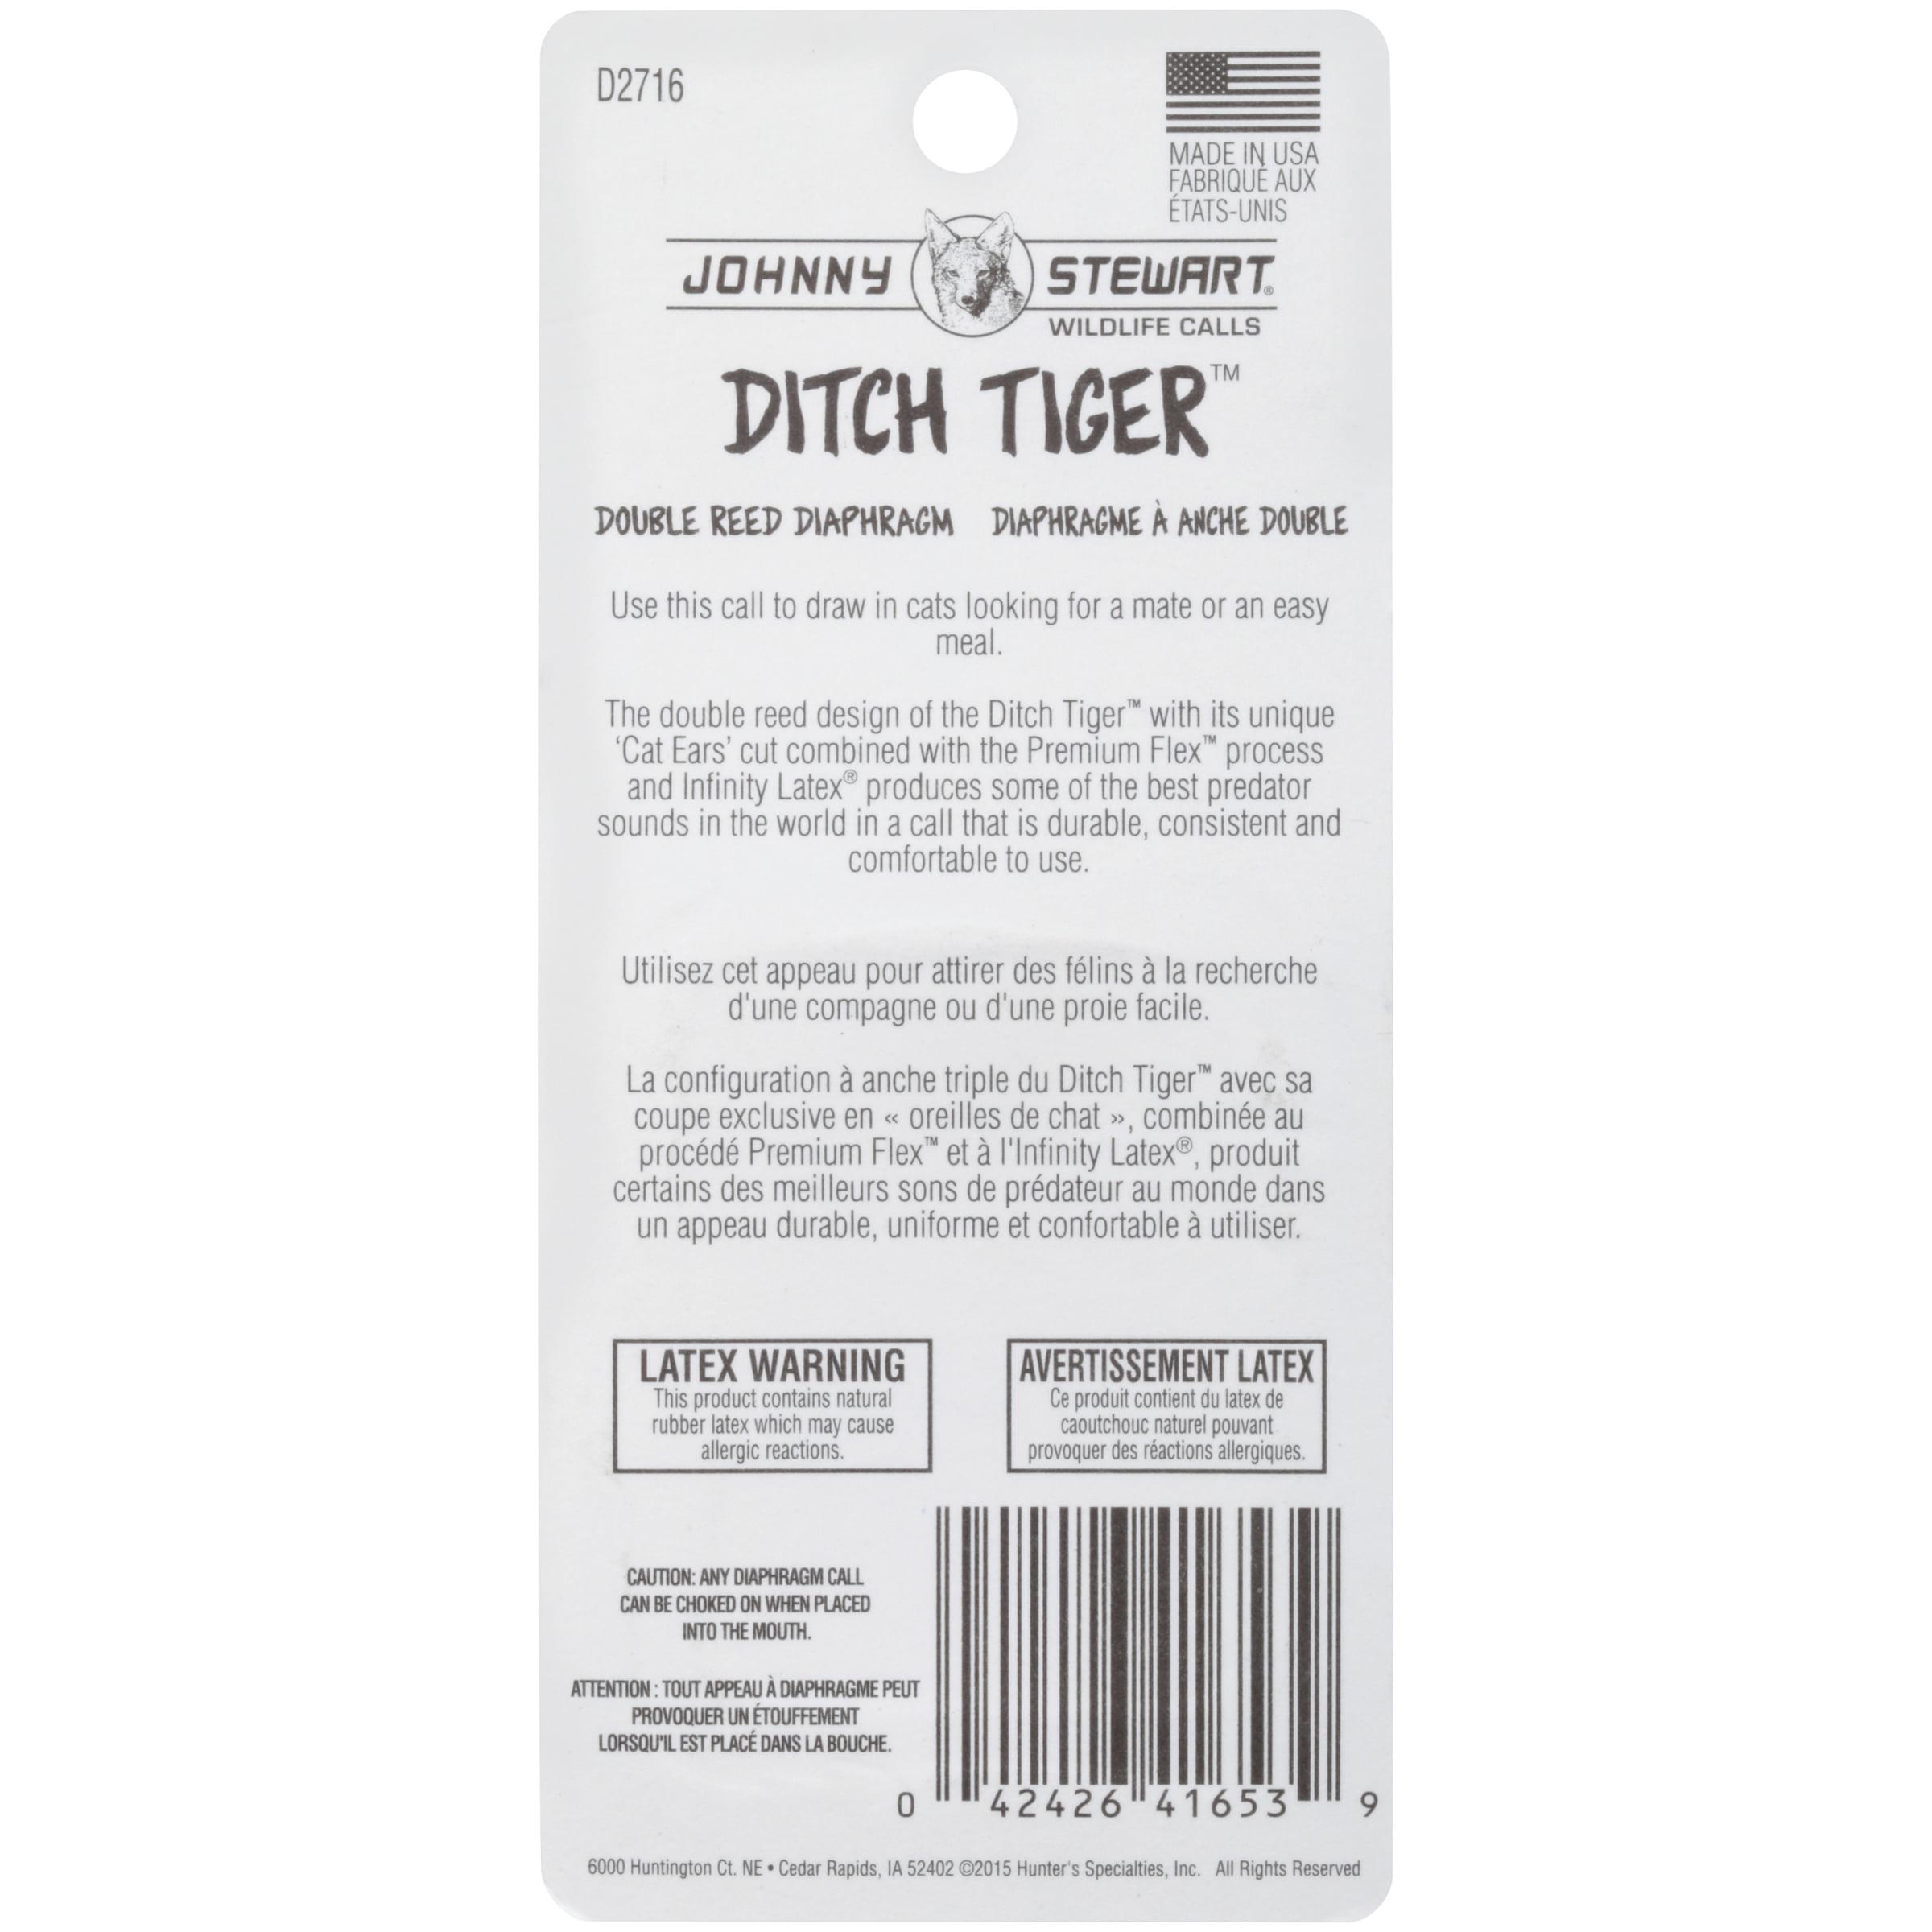 Johnny Stewart® Ditch Tiger™ Premium Flex™ Double Reed Diaphragm